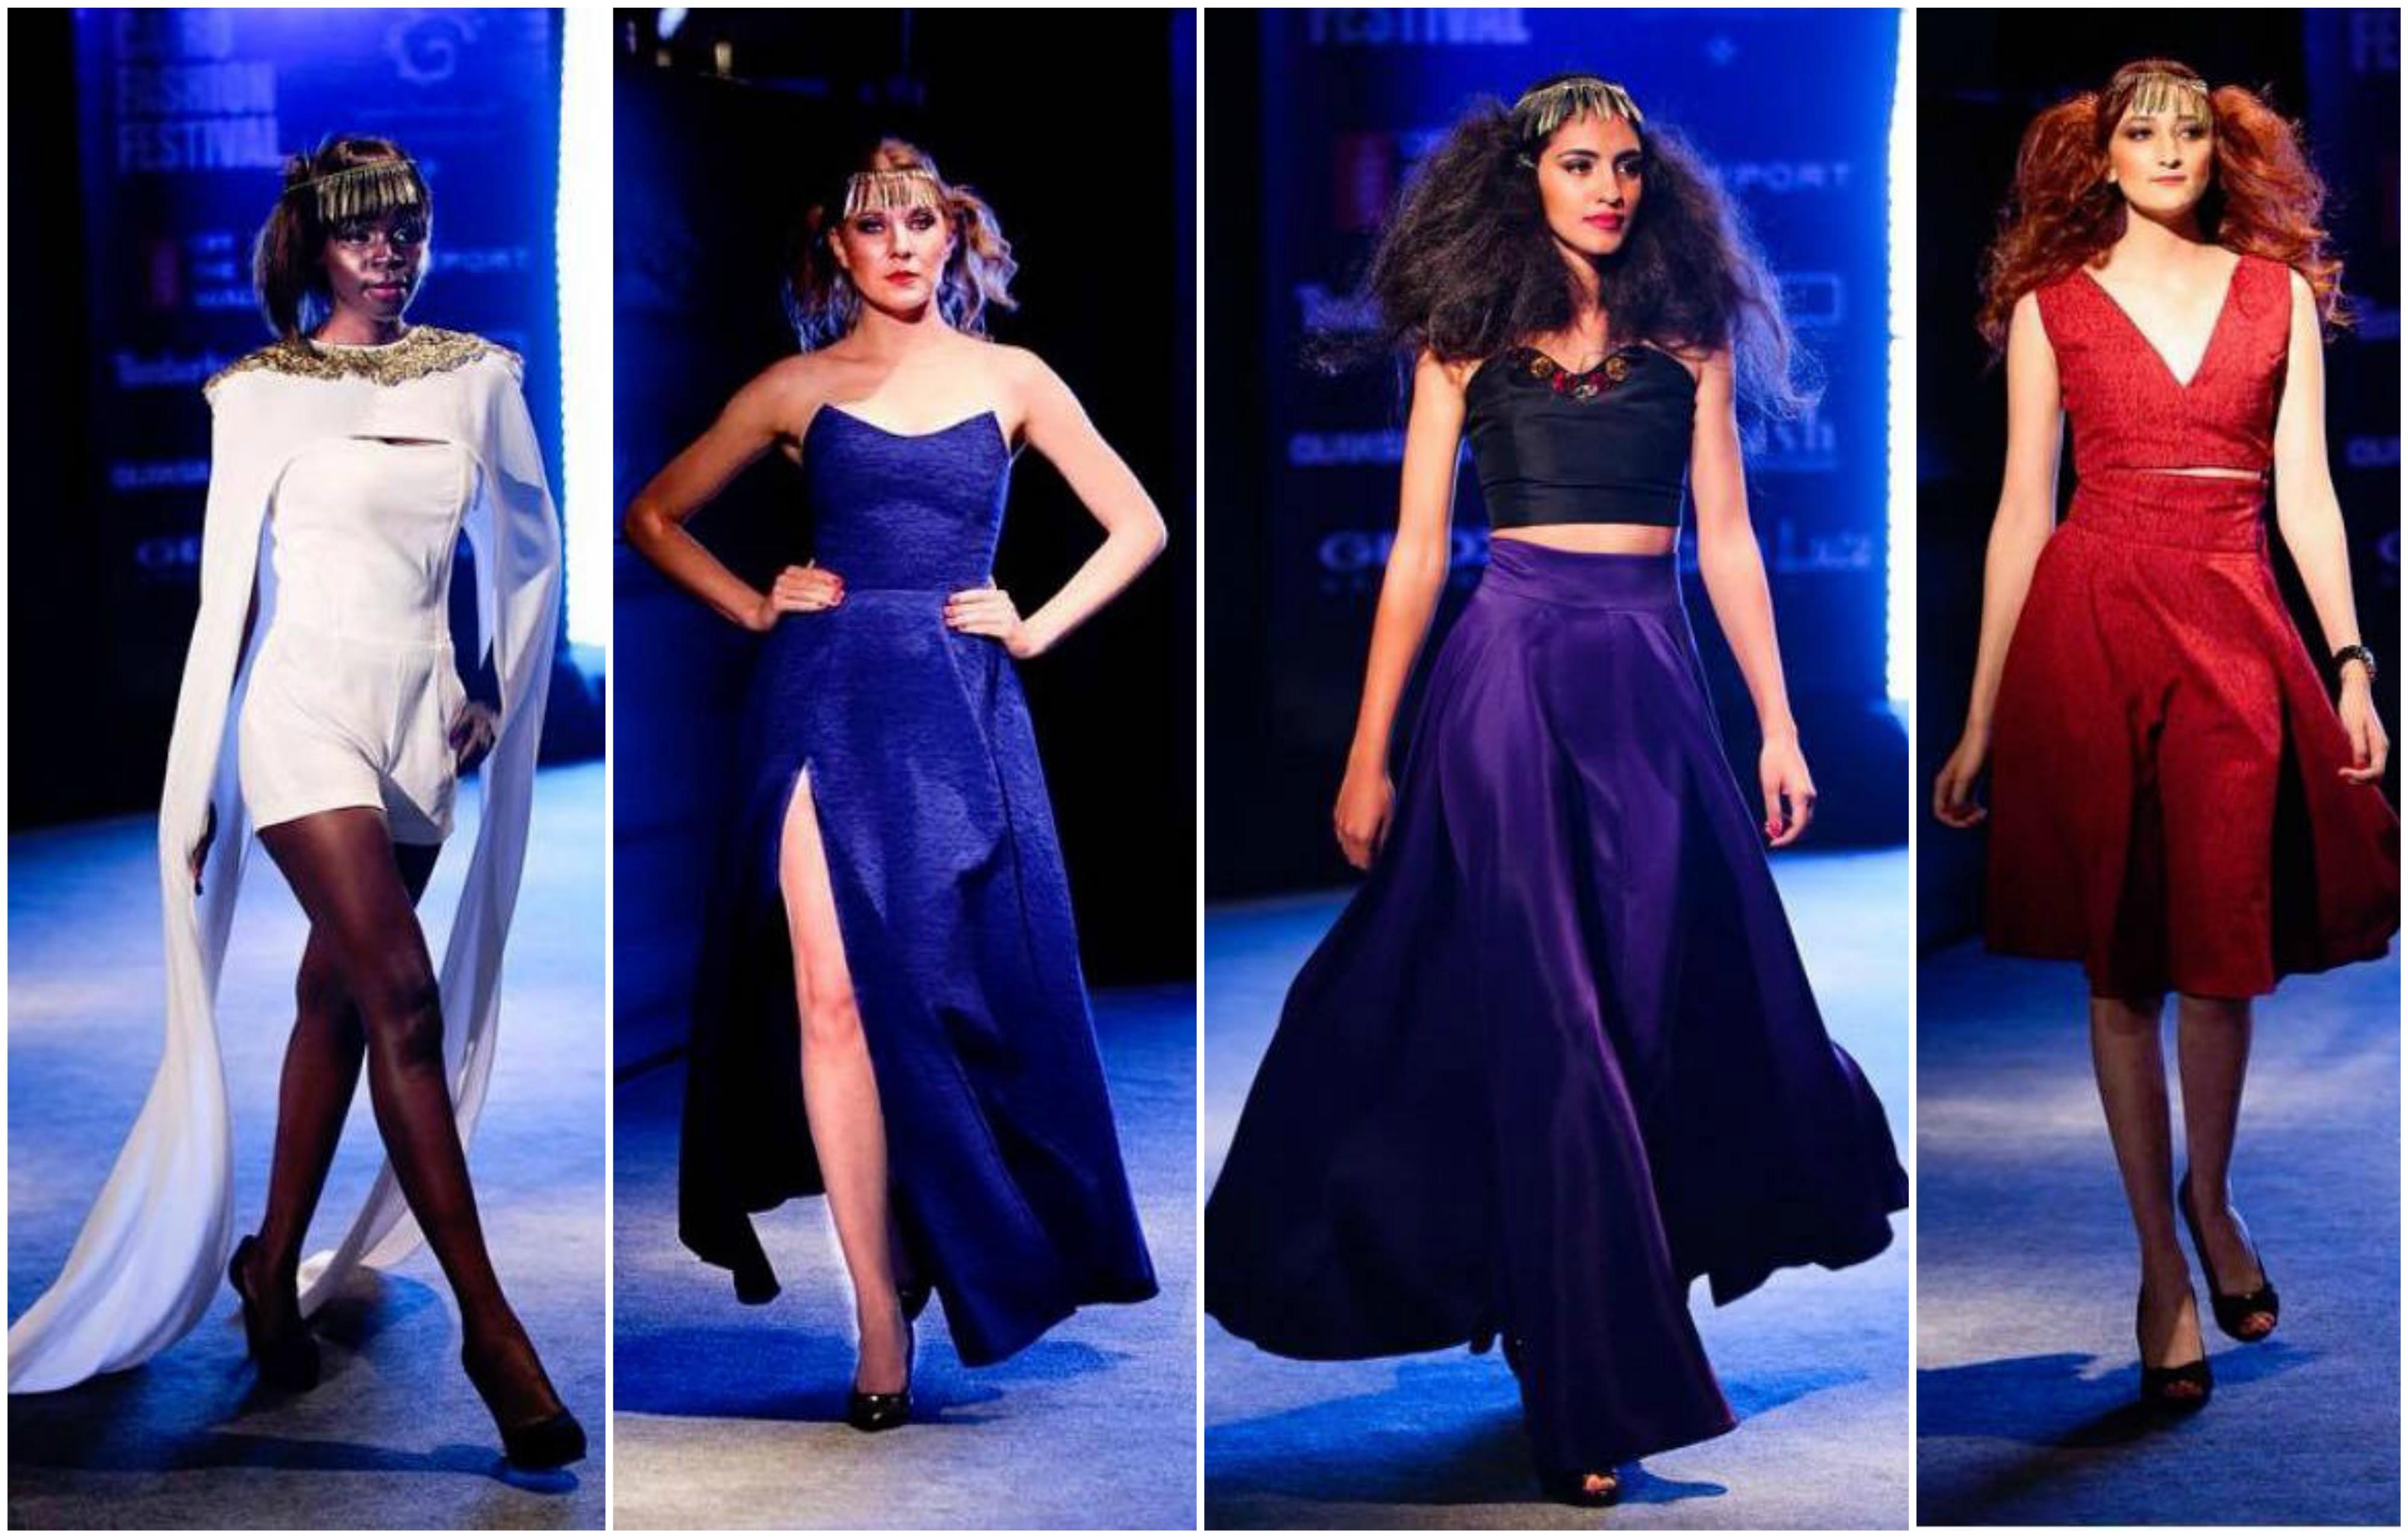 cairo-fashion-festival-season-4-runway